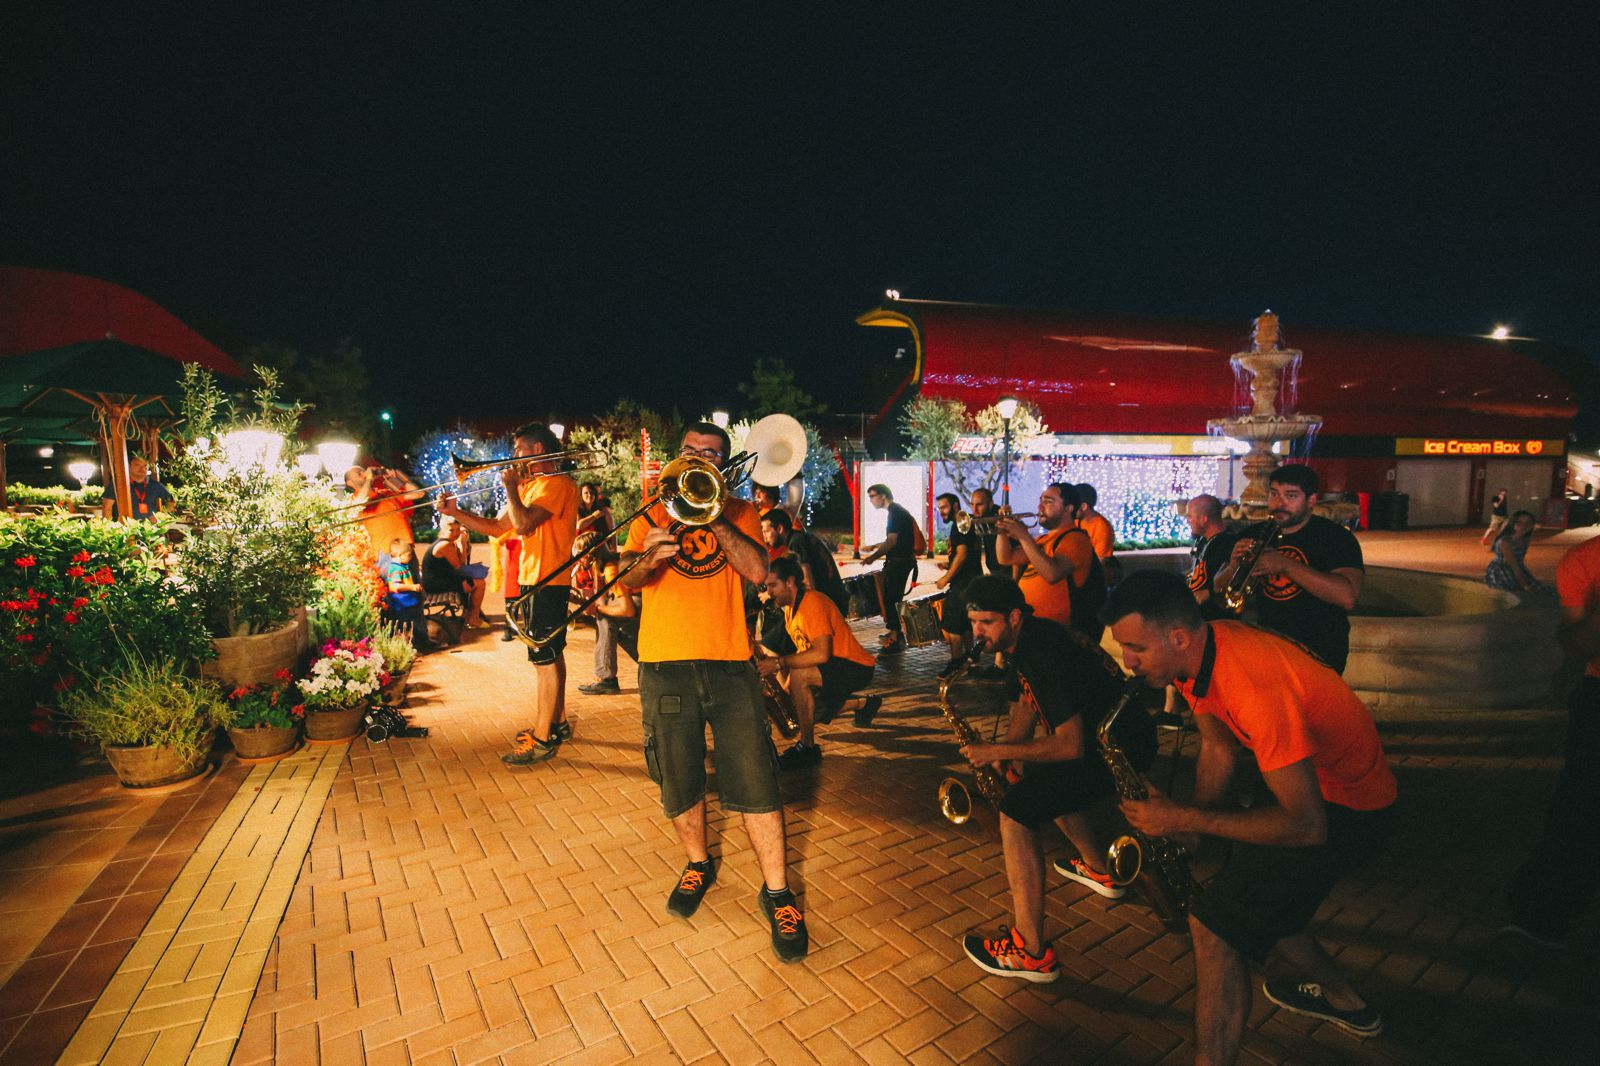 Midnight Partying At Ferrari Land... In PortAventura, Spain (49)